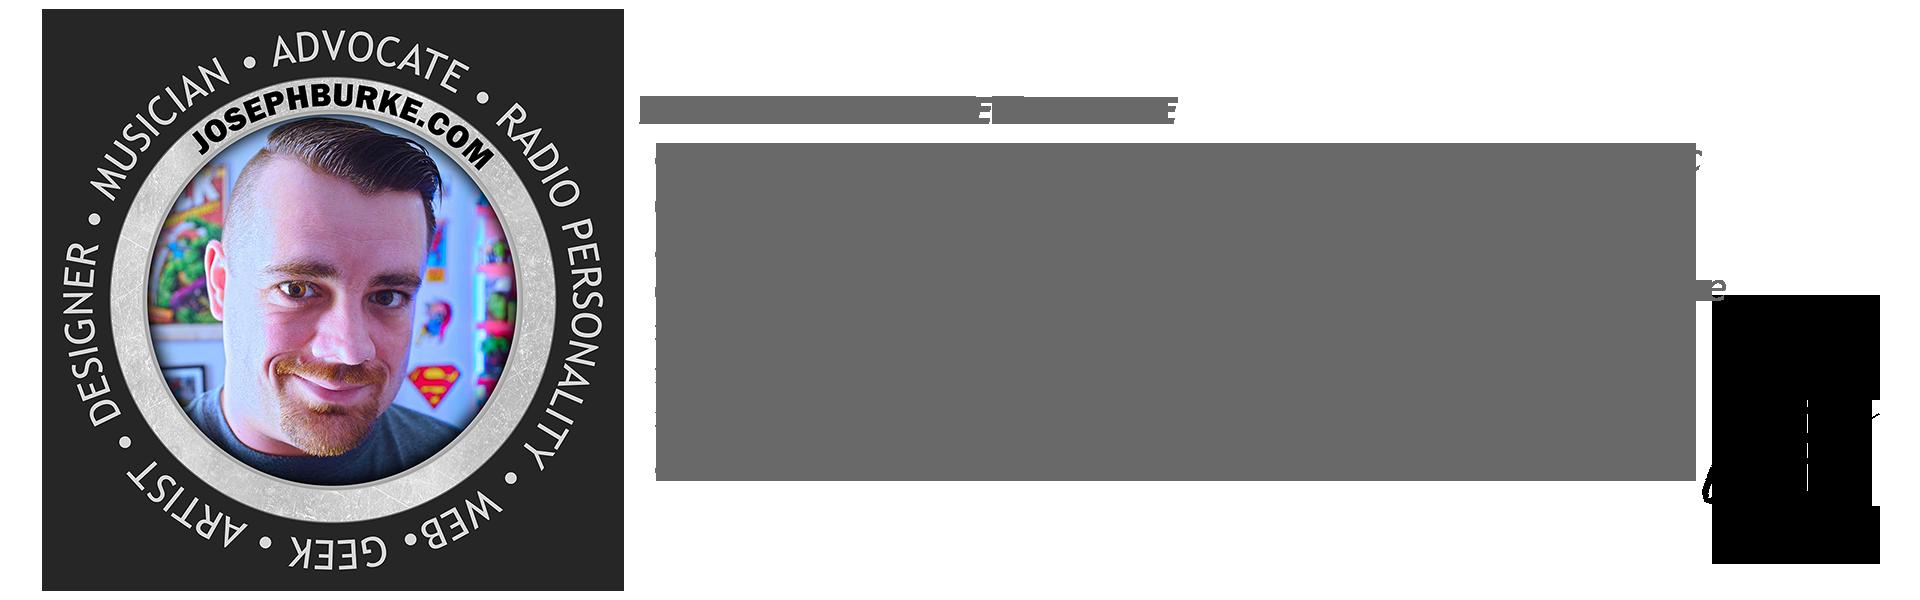 Burke Works